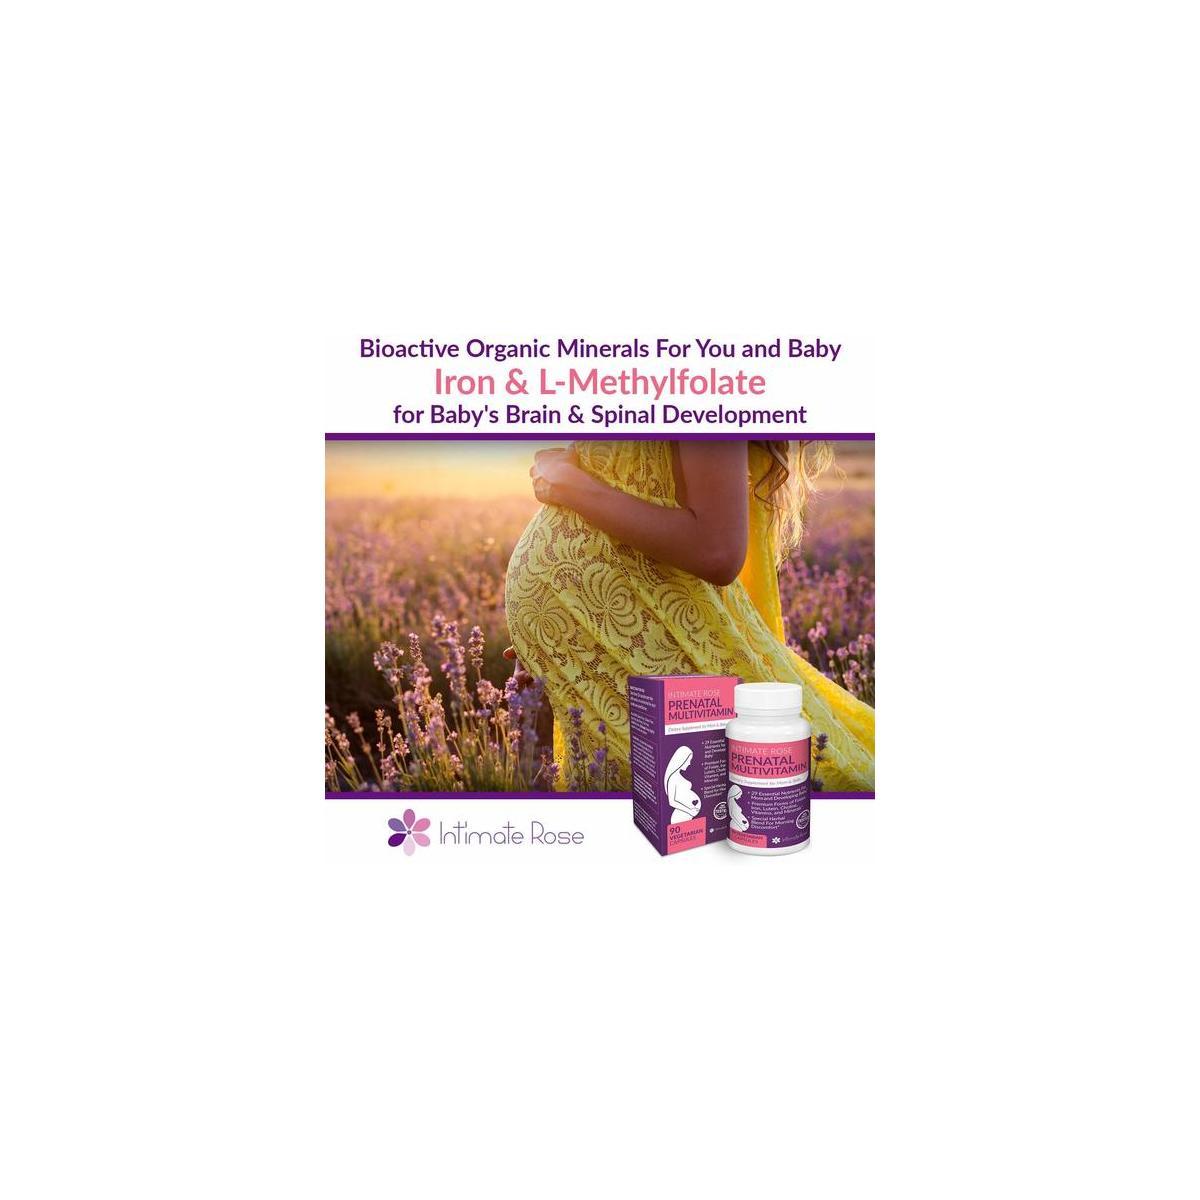 Intimate Rose - Organic Prenatal Vitamins - 30 Day Supply - Methylfolate Folic Acid - Natural Herbal Supplements - Prenatal Vitamins with Iron - Prenatal Multivitamin